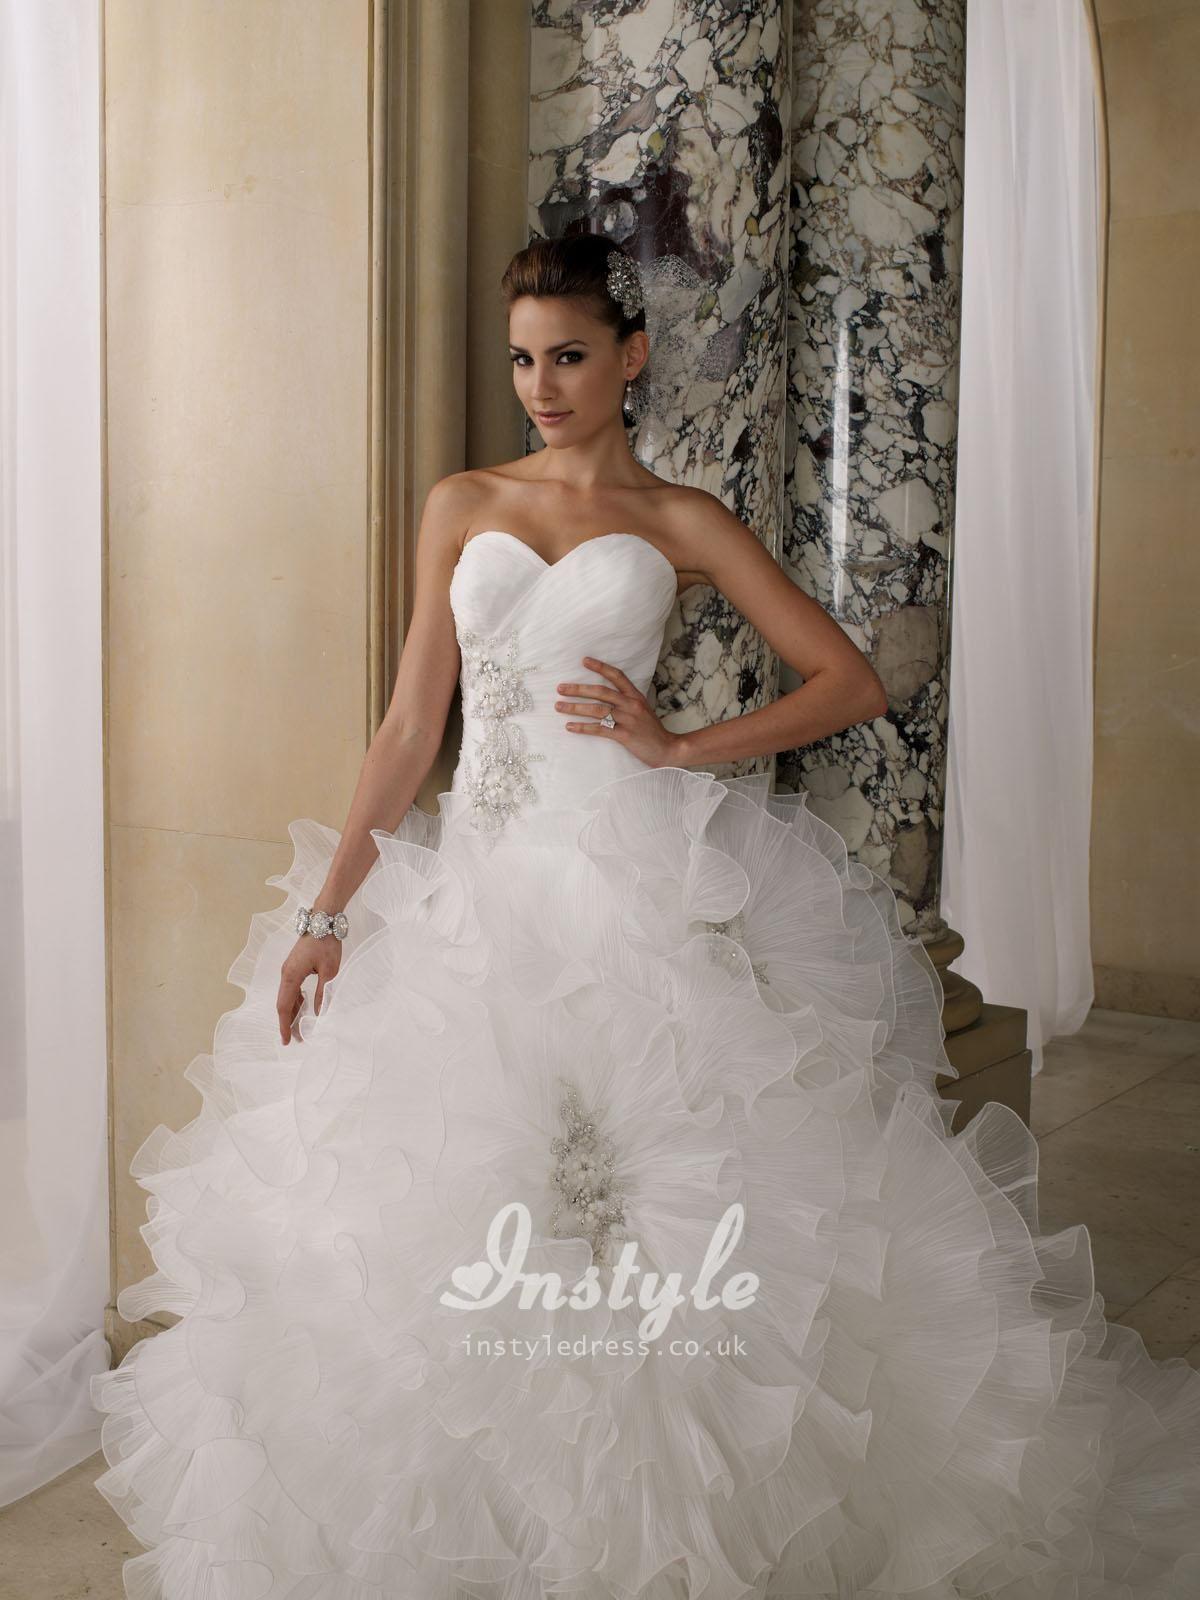 Sweetheart ball gown wedding dress  Crystal Pleated Organza Ruffled Sweetheart Ball Gown Wedding Dress